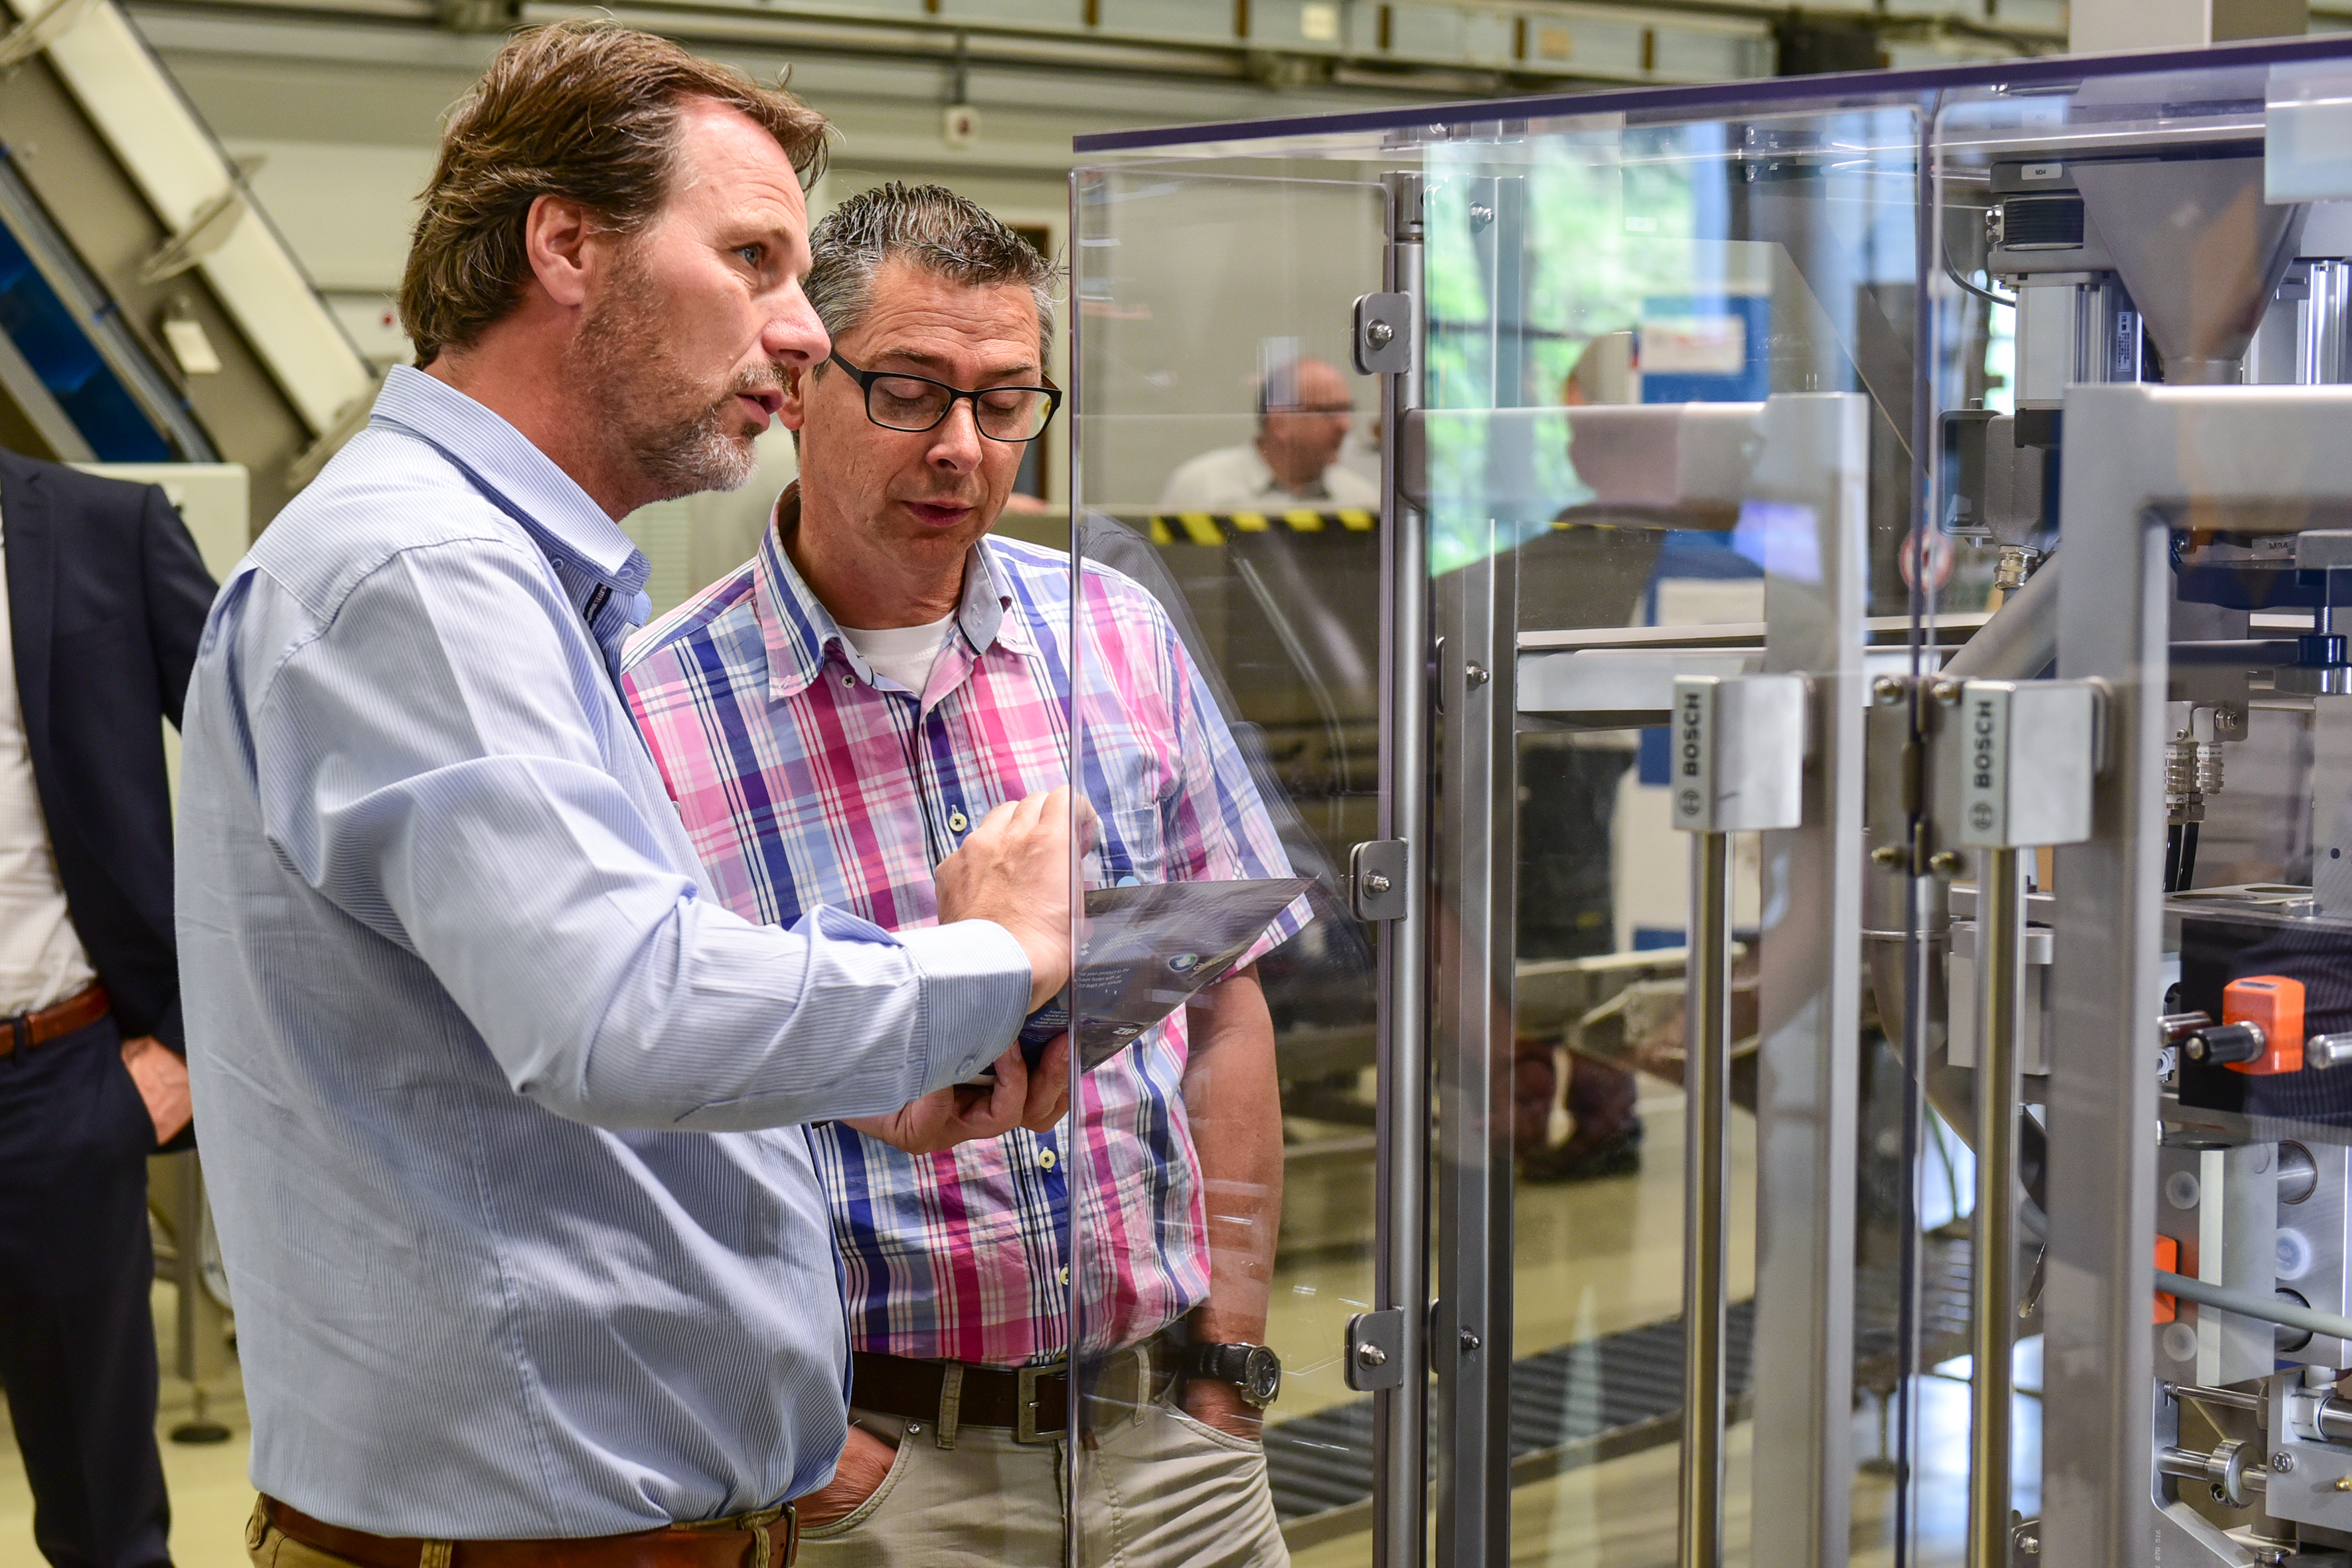 Experience Bosch's customer solutions center in Weert first-hand